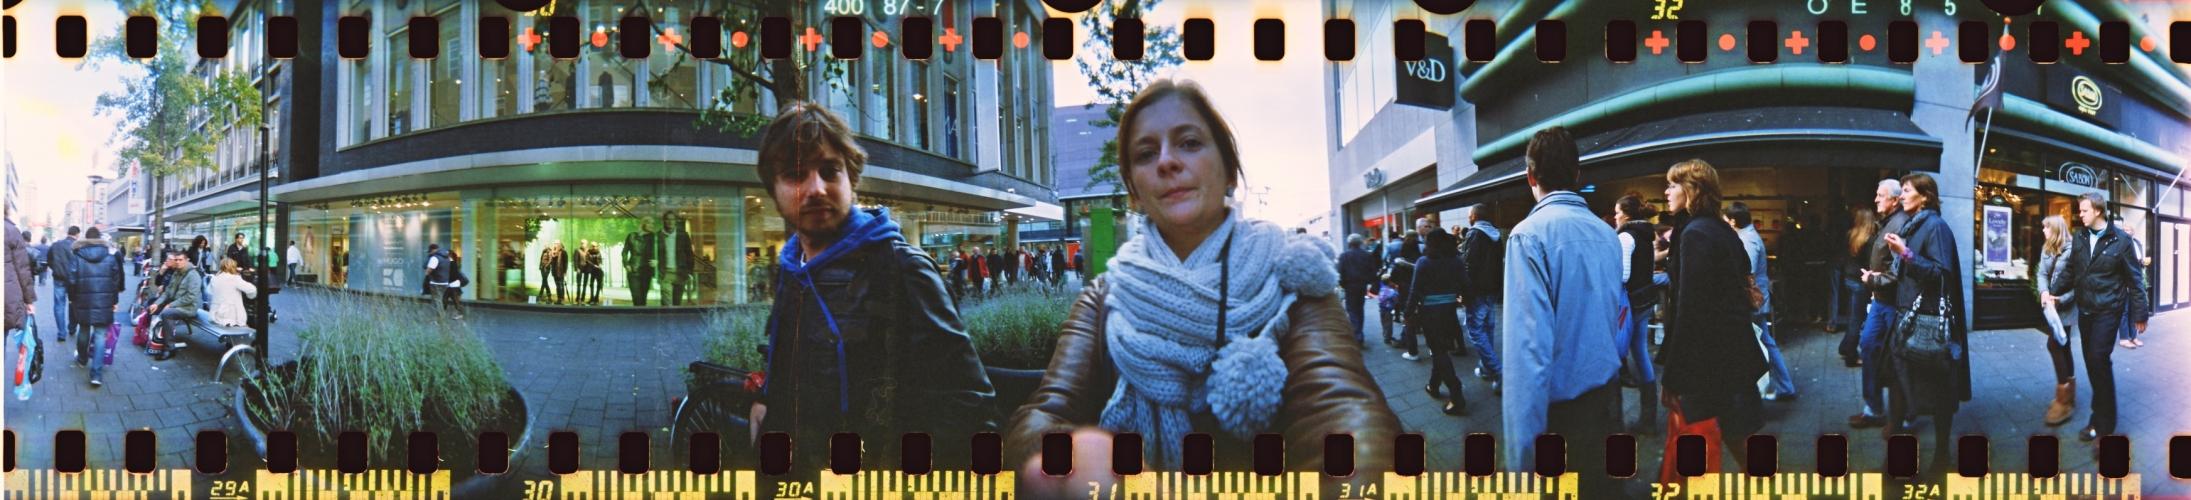 360_rotterdam_0006__medium.jpg